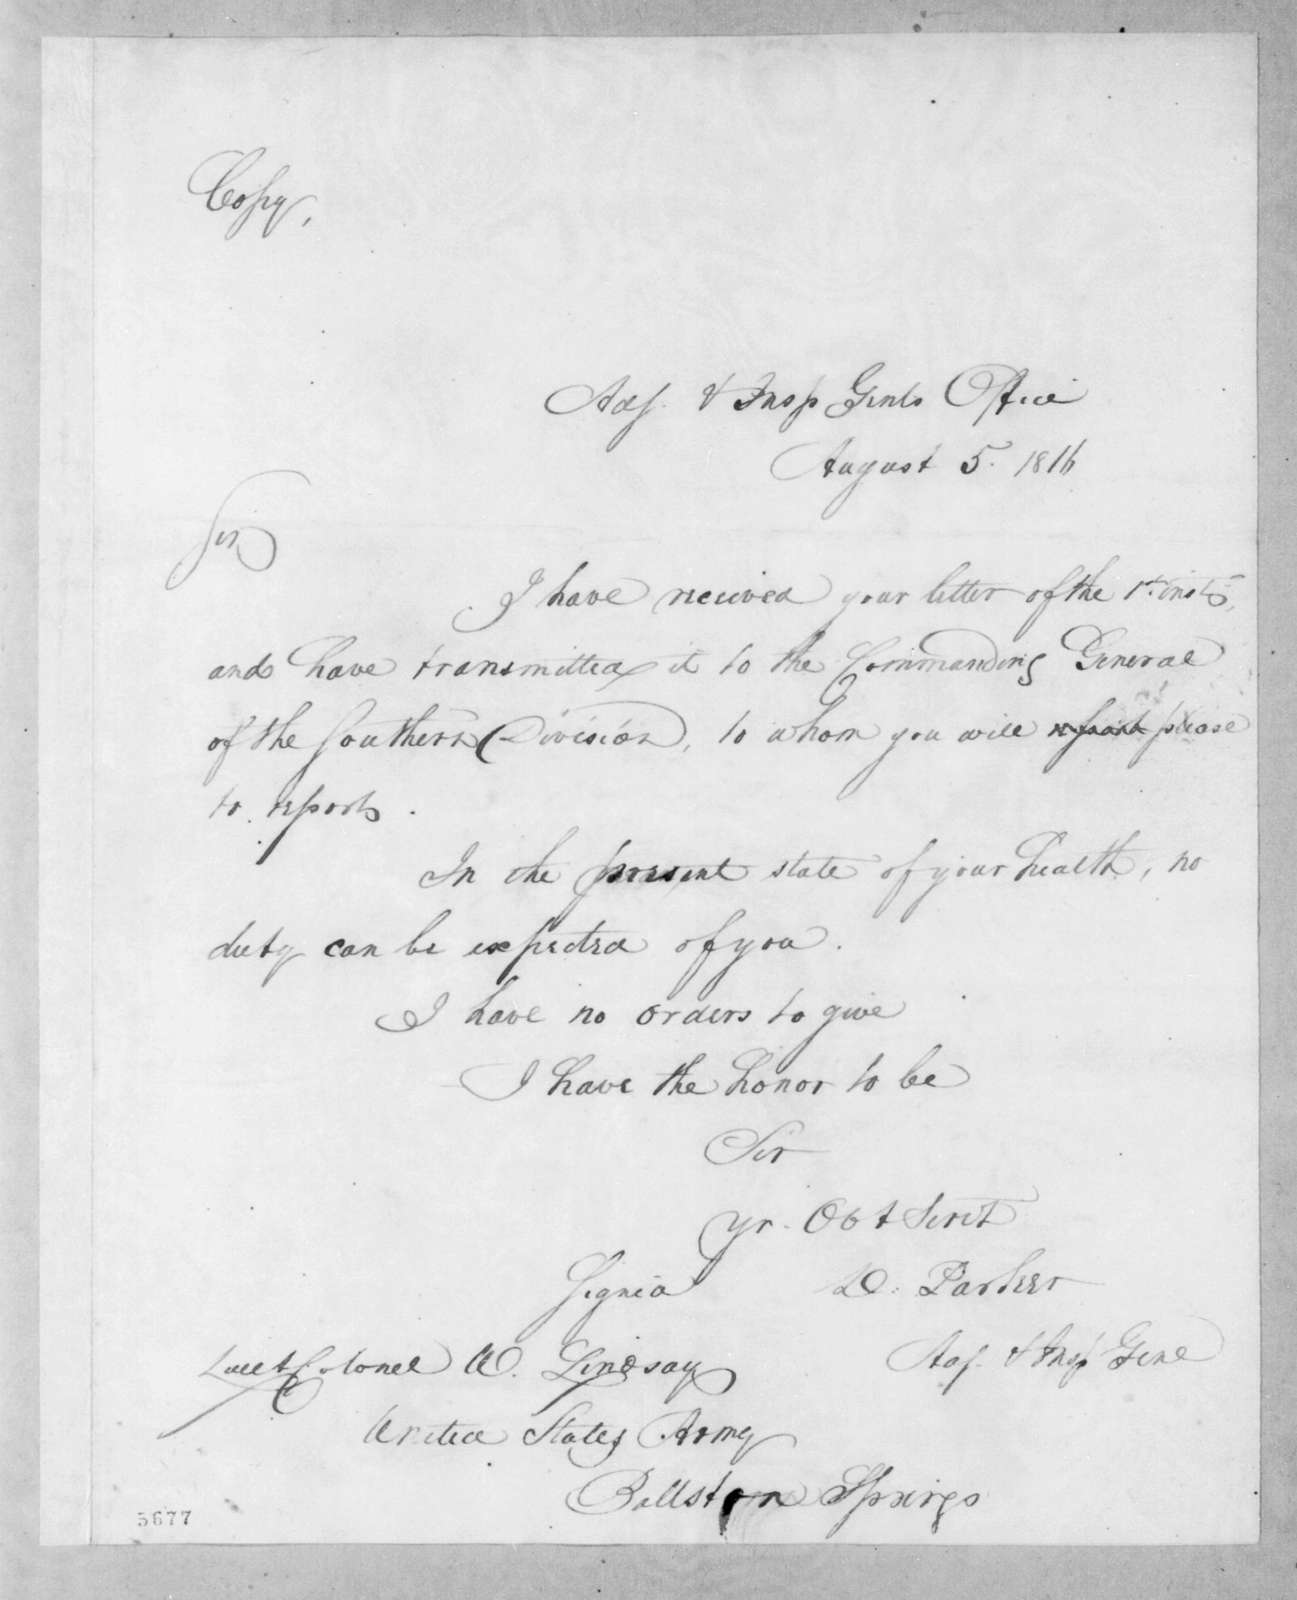 Daniel Parker to William Lindsay, August 5, 1816